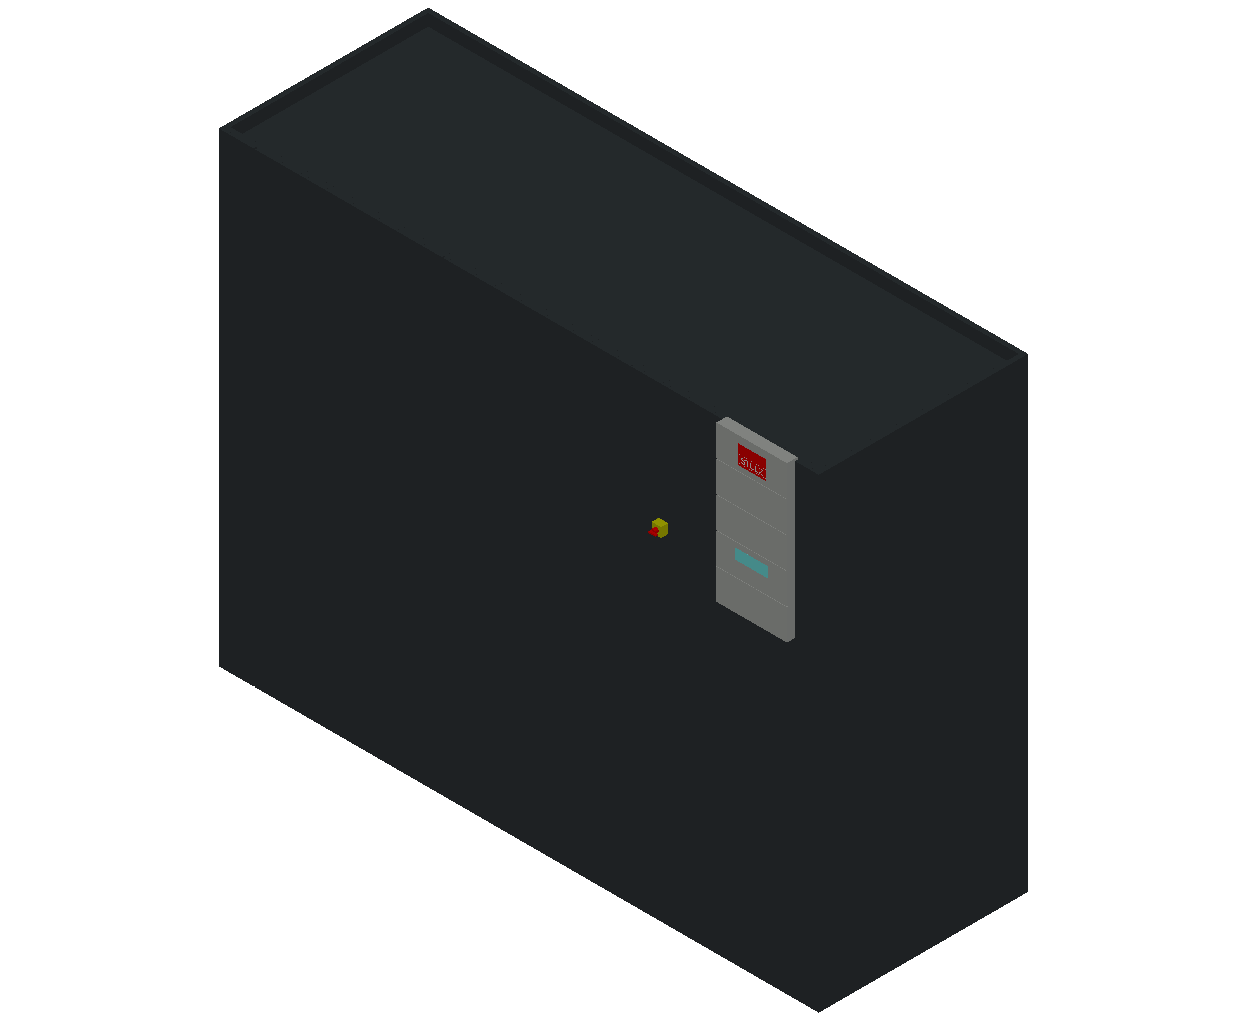 HC_Air Conditioner_Indoor Unit_MEPcontent_STULZ_CyberAir 3PRO_ALD_Dual Circuit GE_ALD_652_GE_INT-EN.dwg